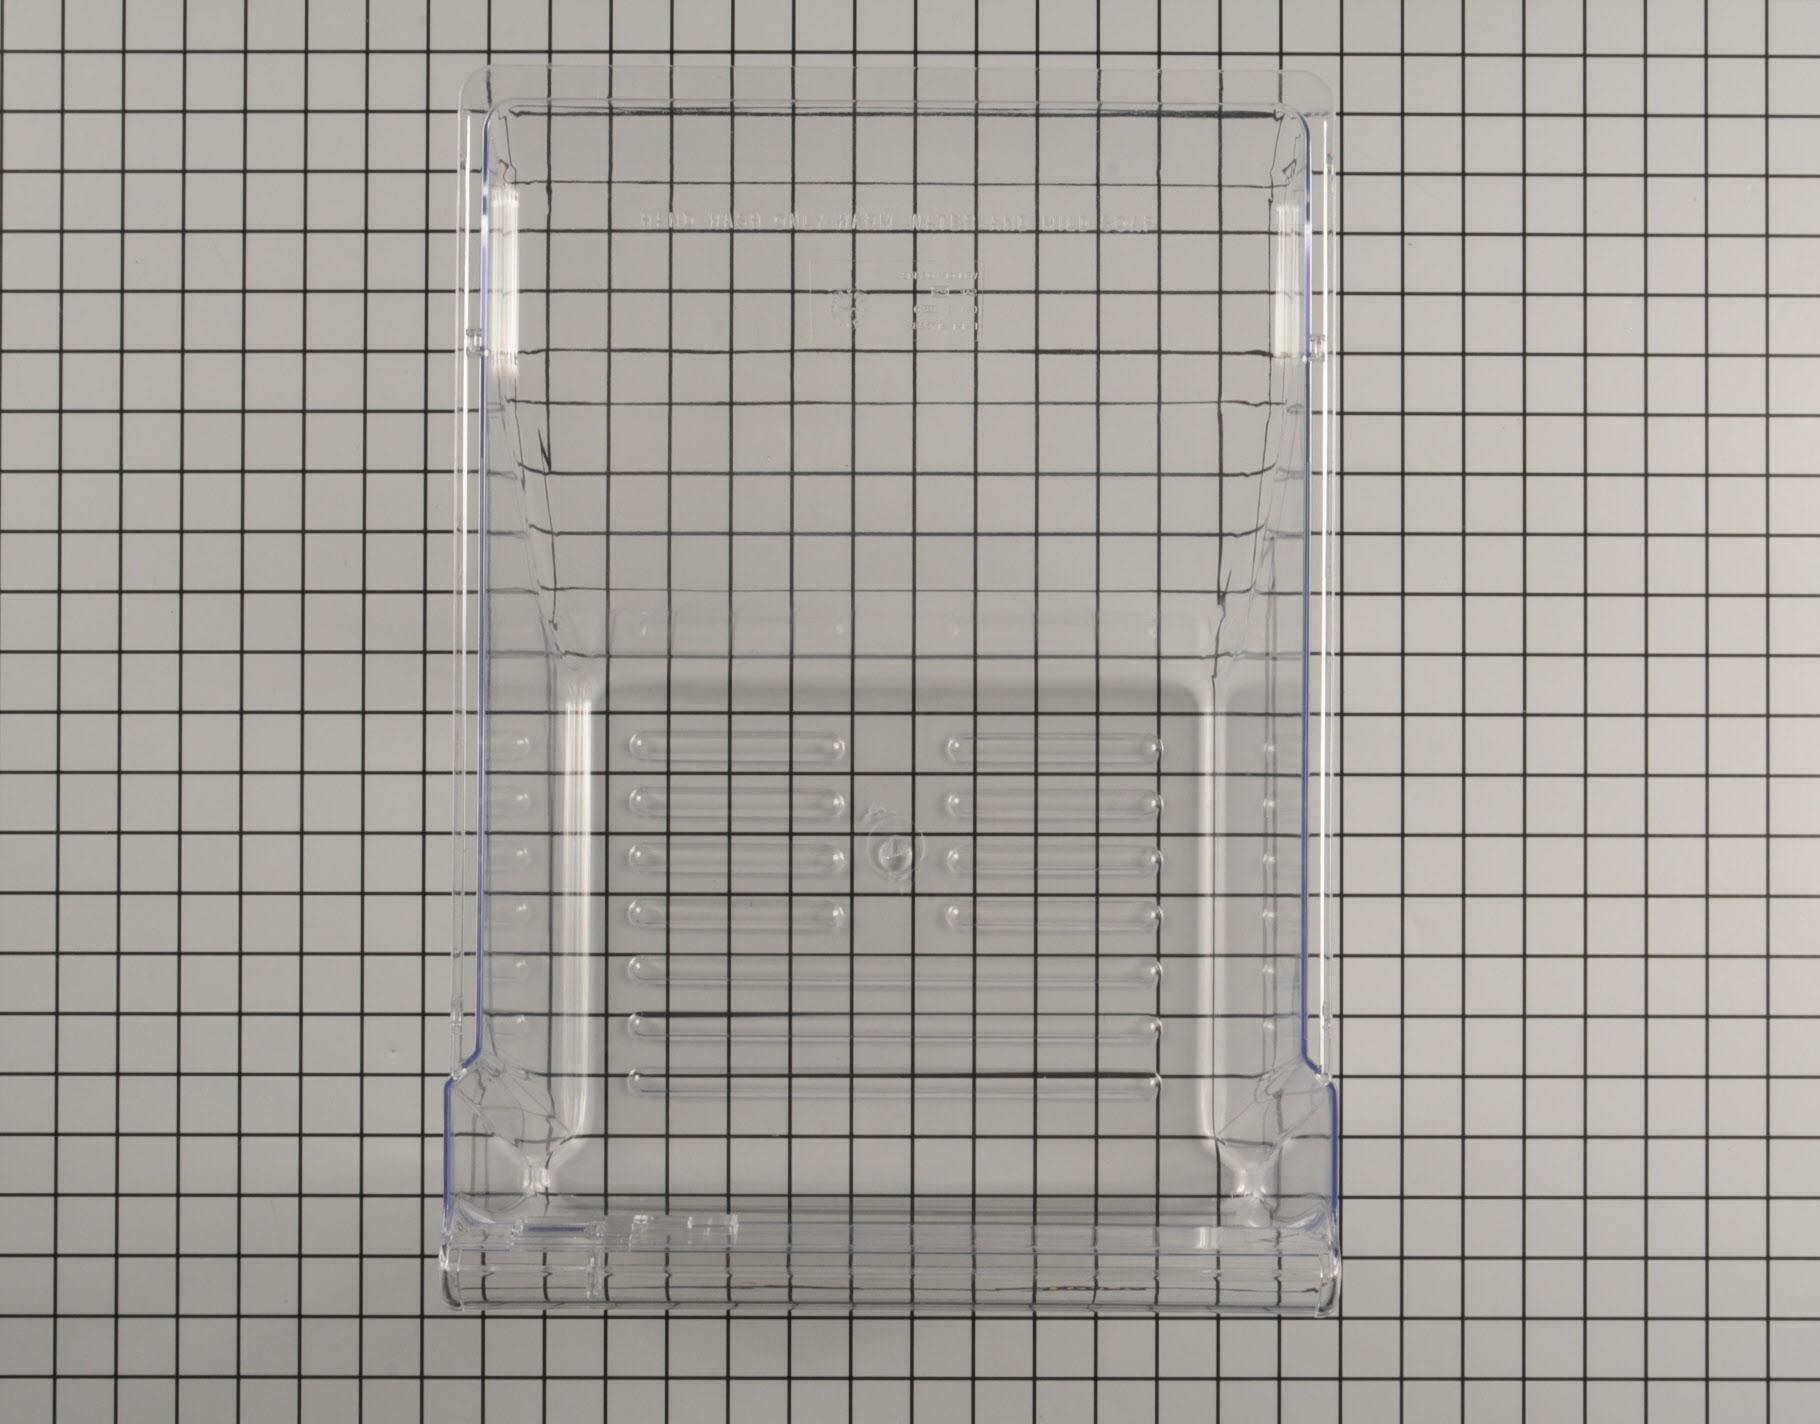 Kenmore Refrigerator Part # W10854037 - Crisper Drawer